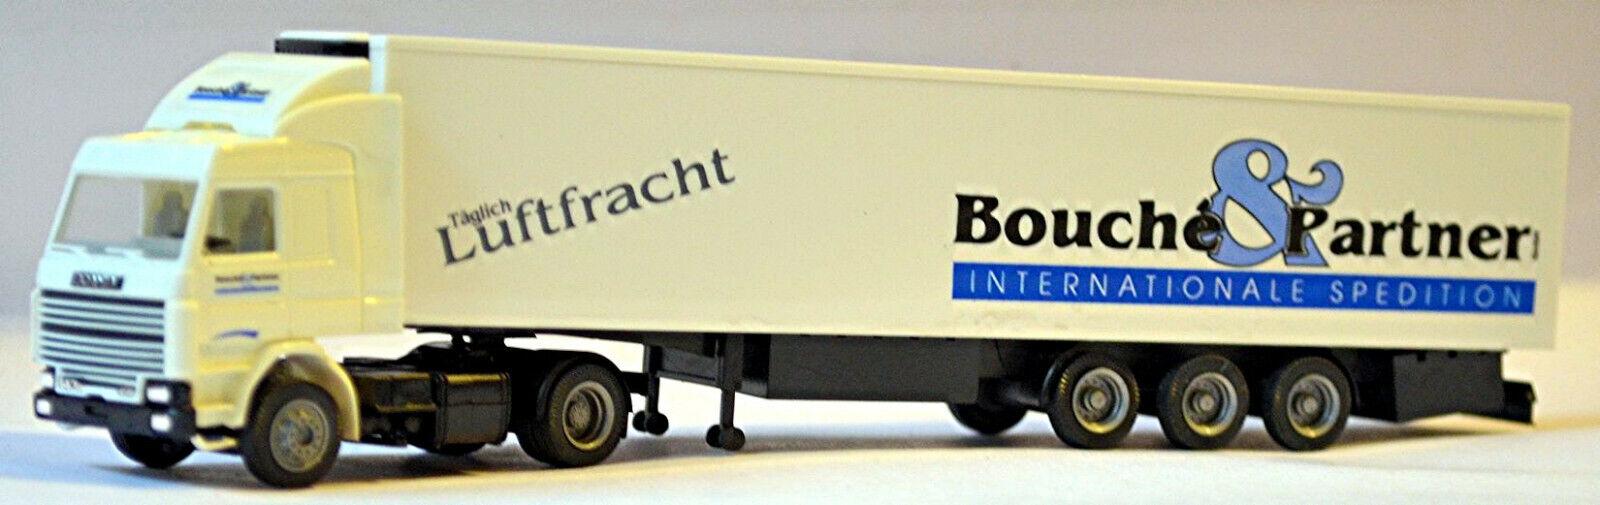 Scania 143 Bouch 65533; Pkonstner bilgo -Aereo Refigerato -Sz 1 87 Albedo 295014